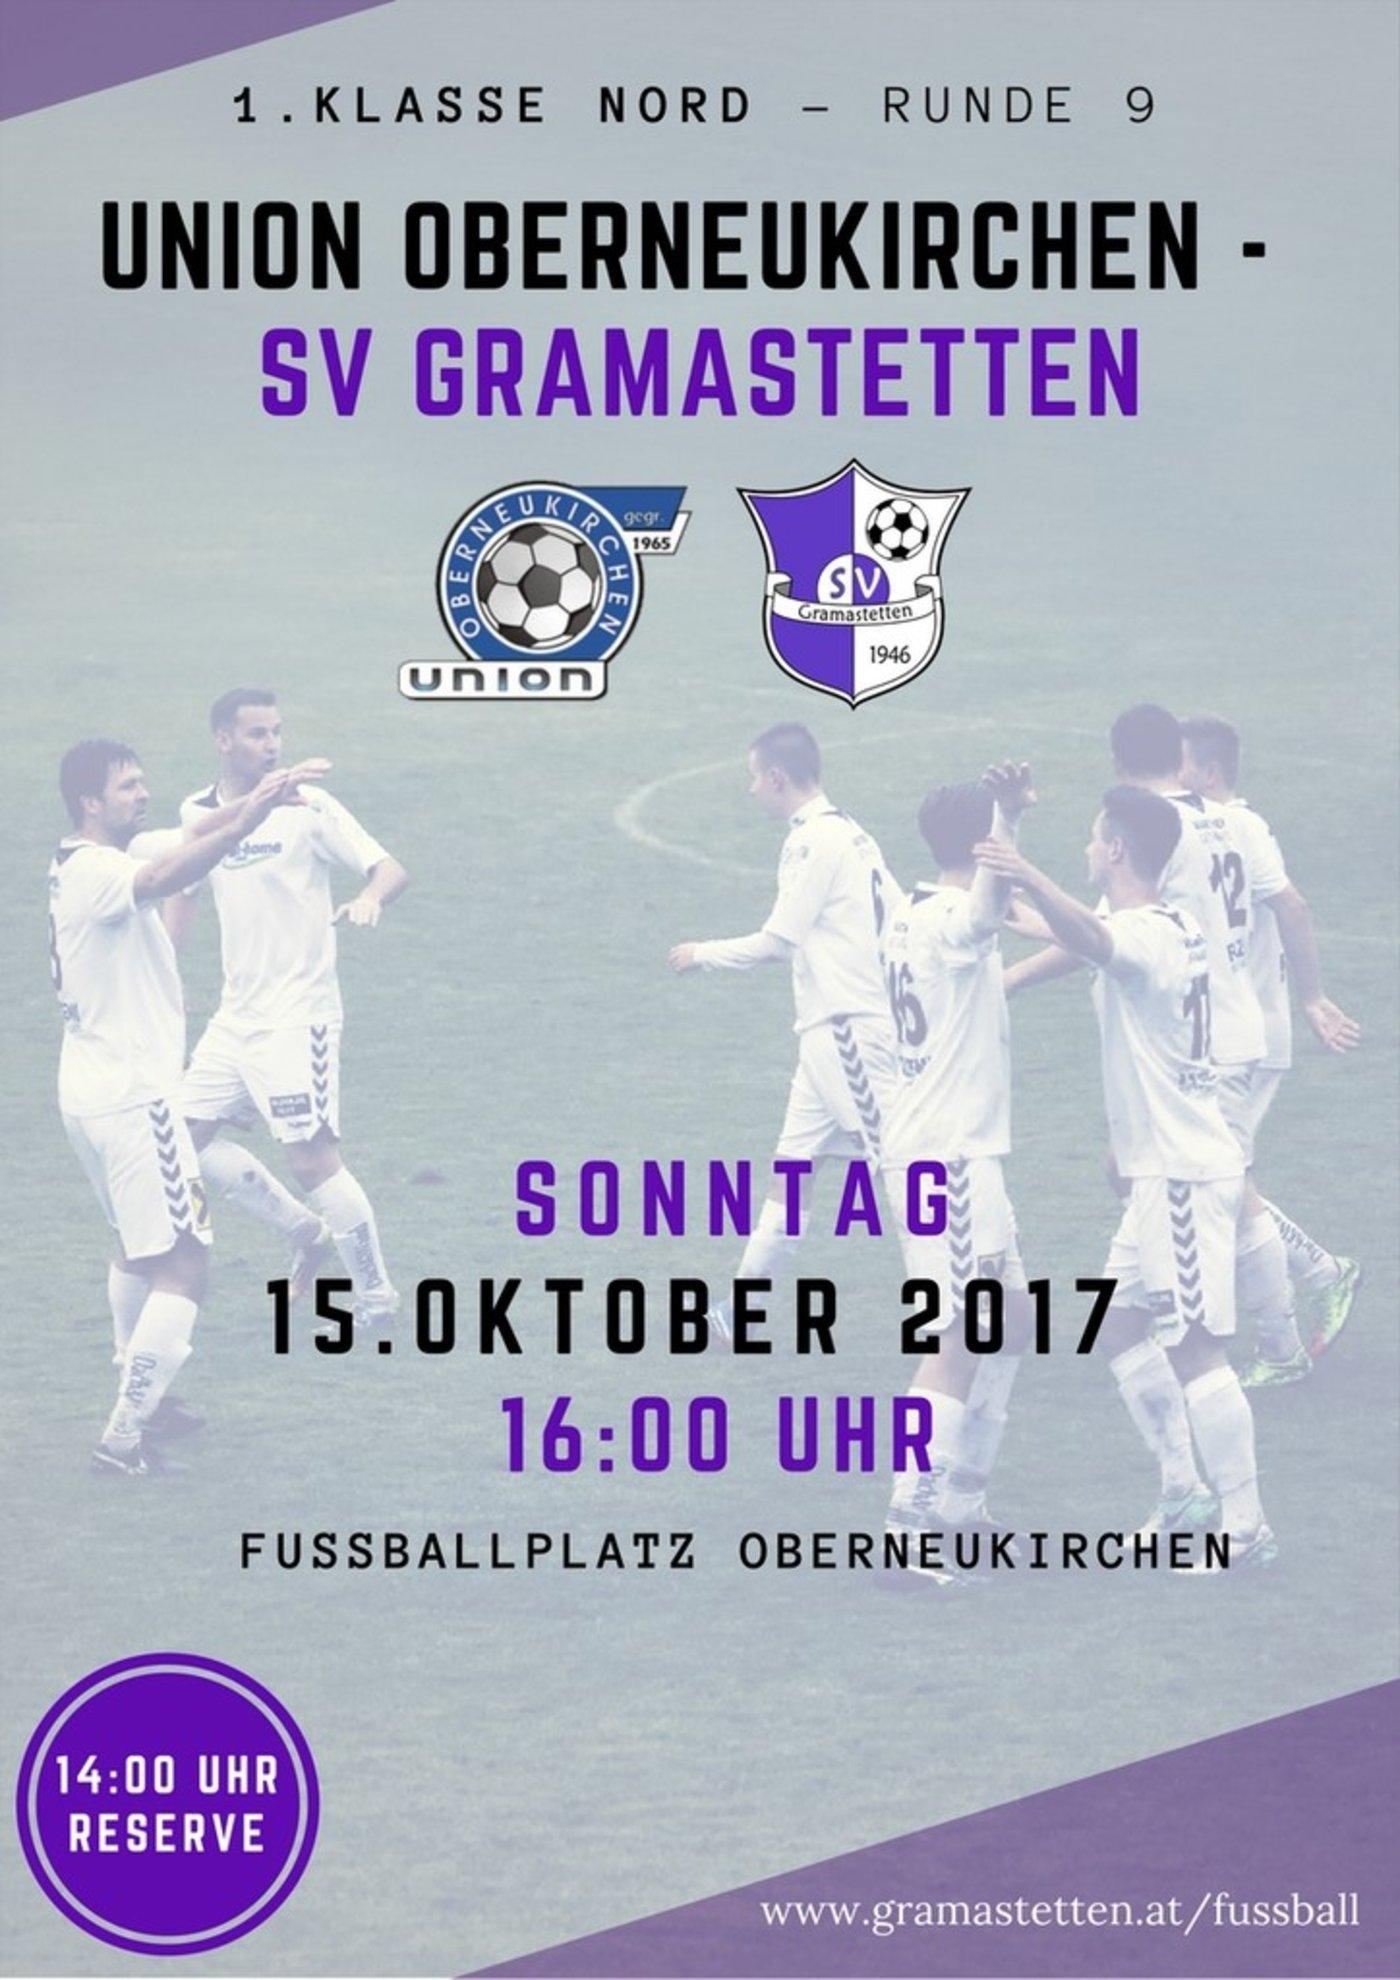 Union Oberneukirchen - SV Gramastetten